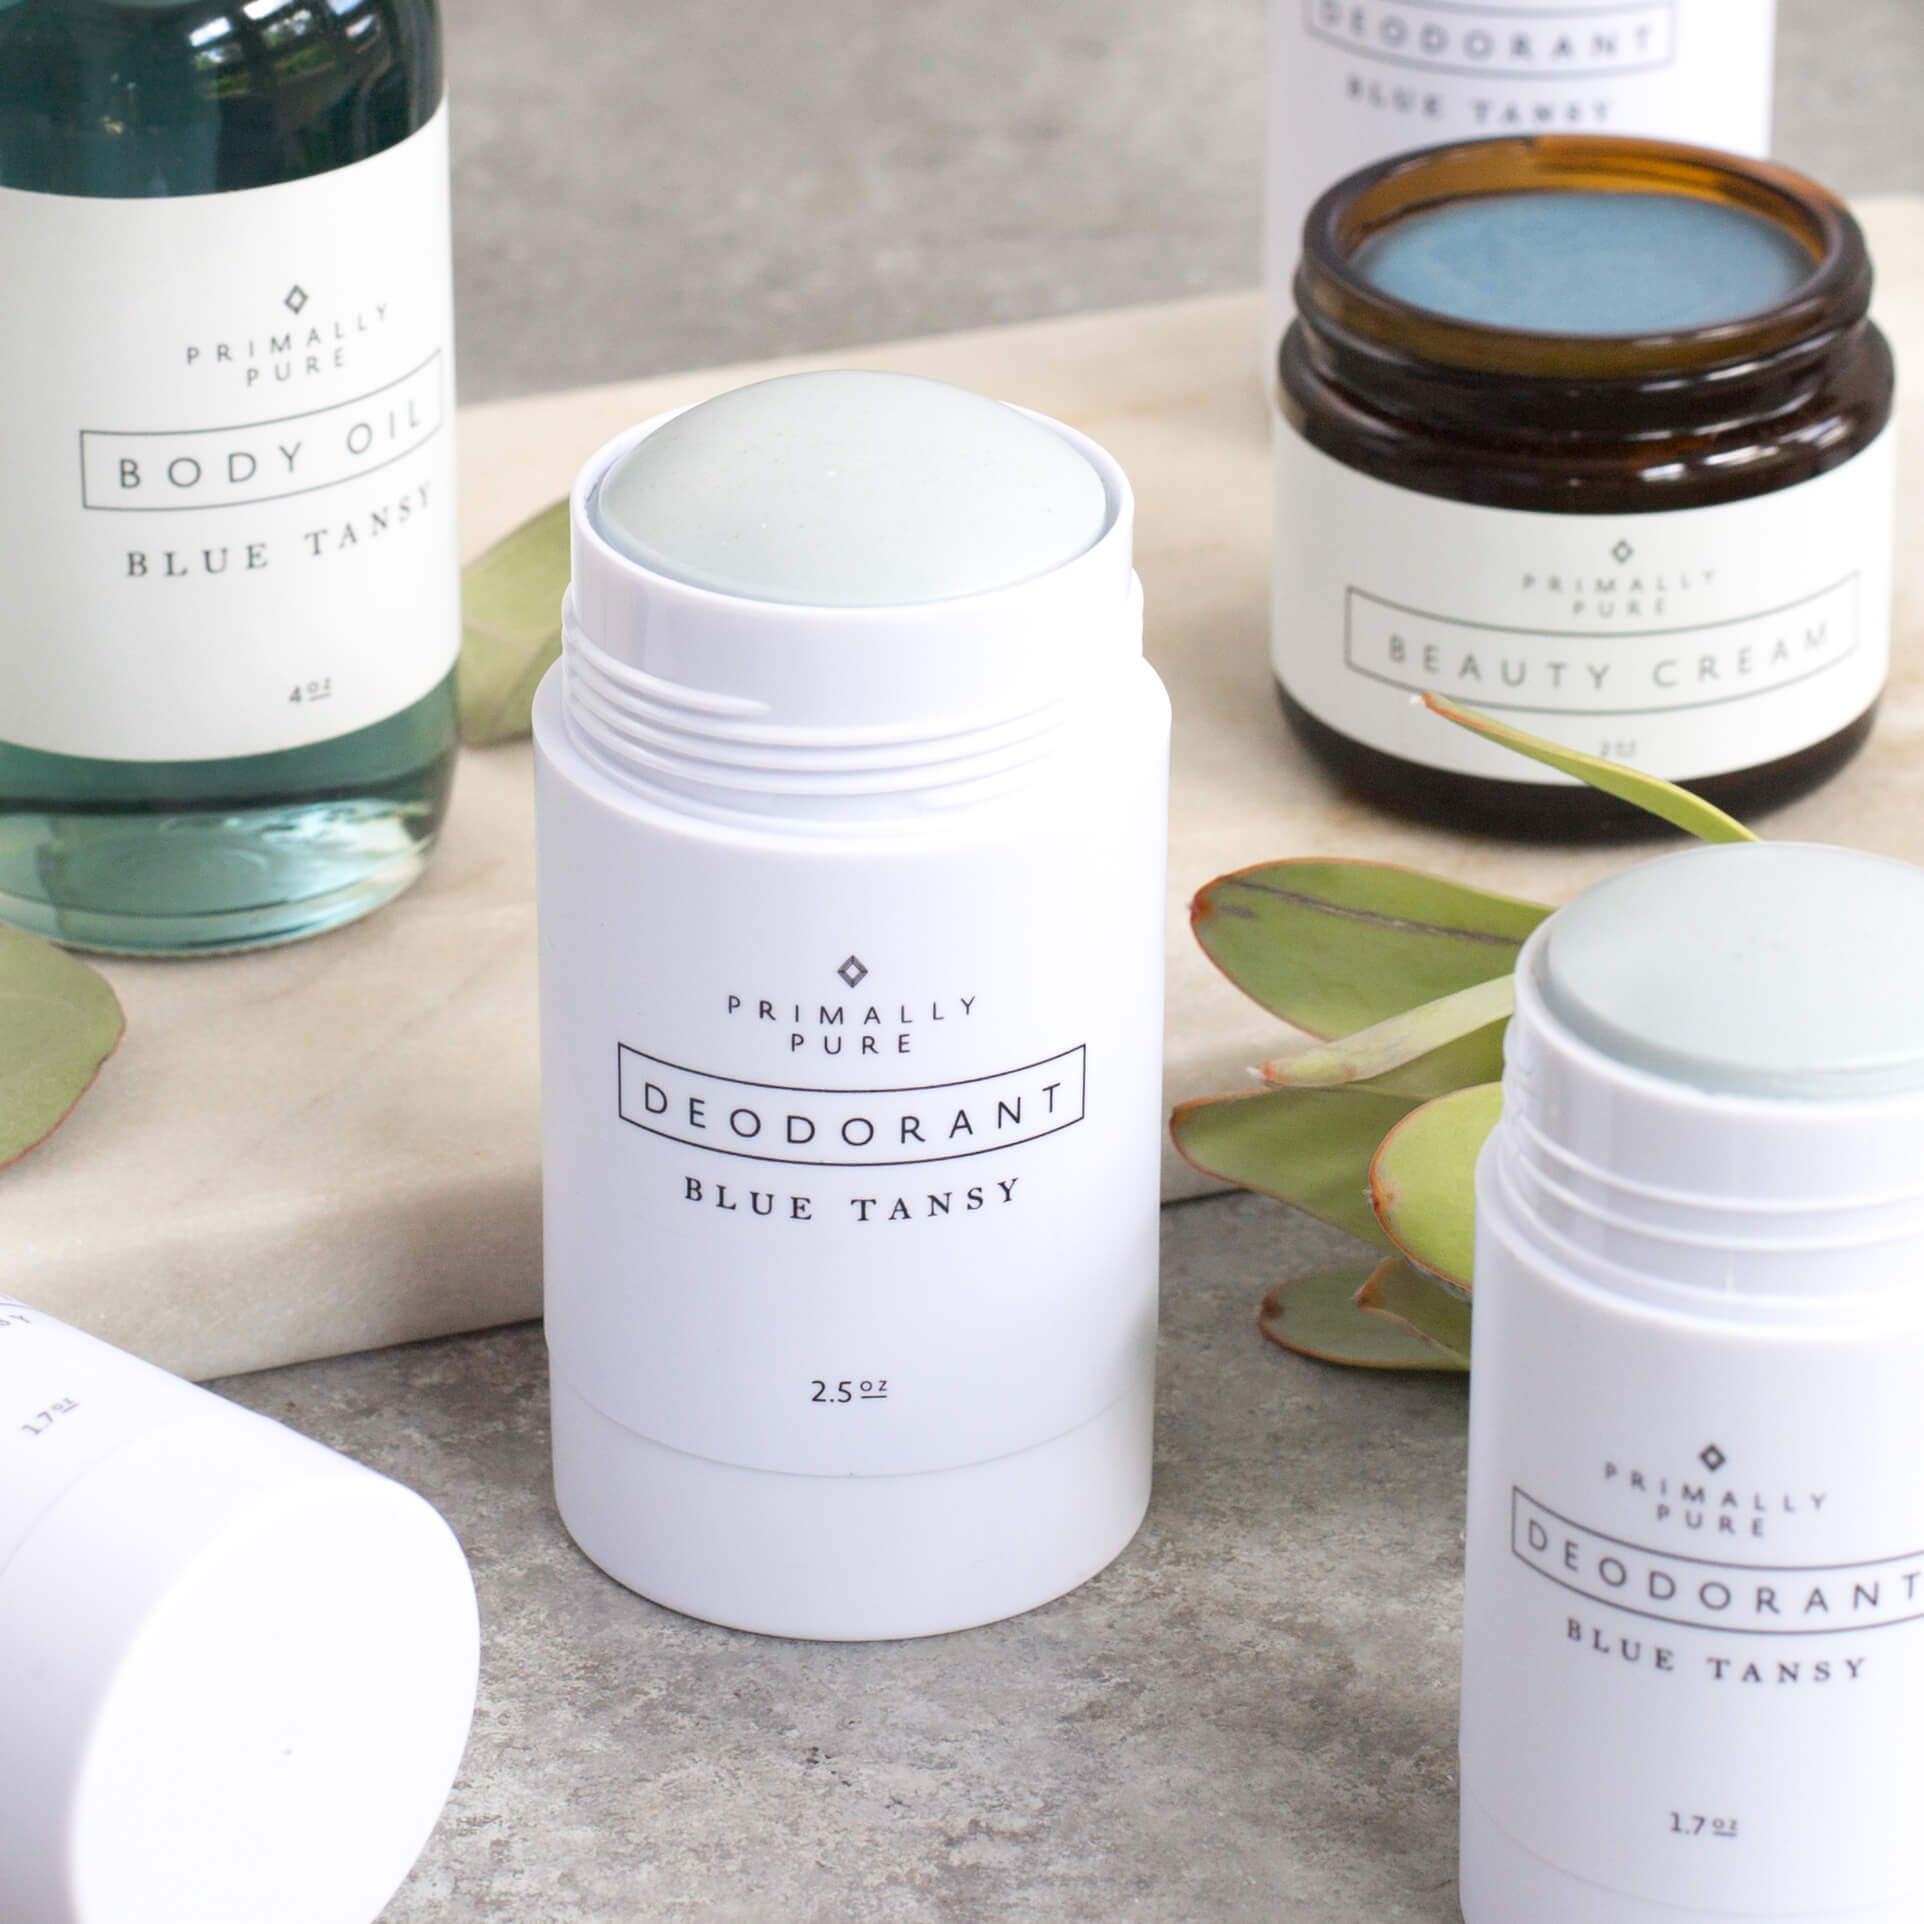 Purely Primal Skincare agutsygirl.com #guthealth #skincare #primallypure #gut Primally Pure deodorant